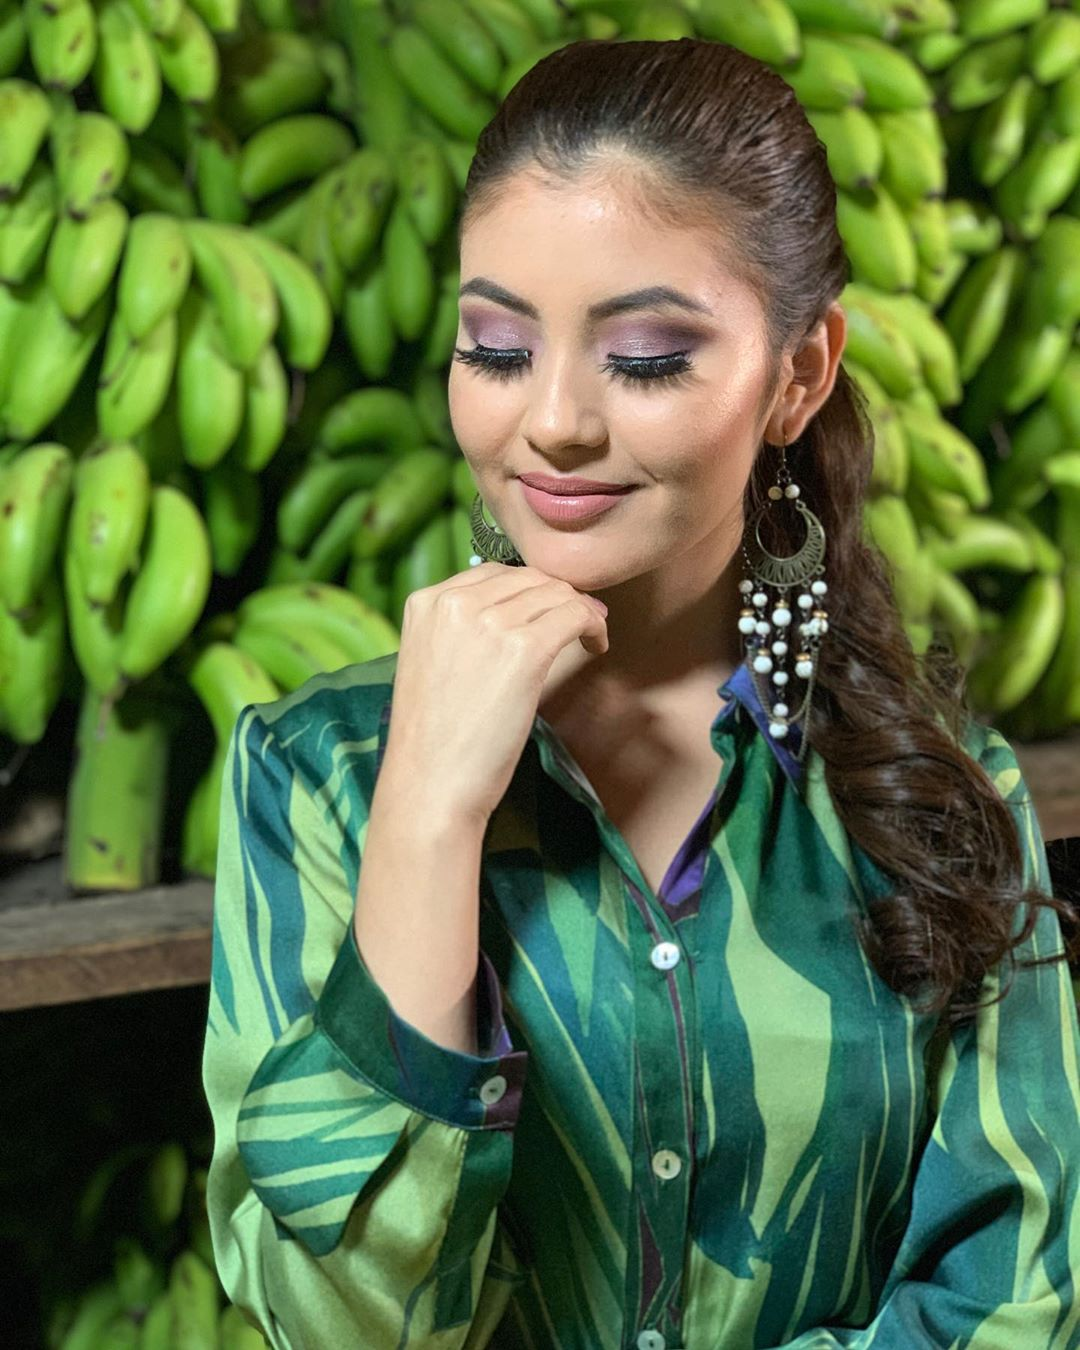 alexandra pinillos, 3ra finalista de reyna mundial banano 2019. - Página 2 67841710